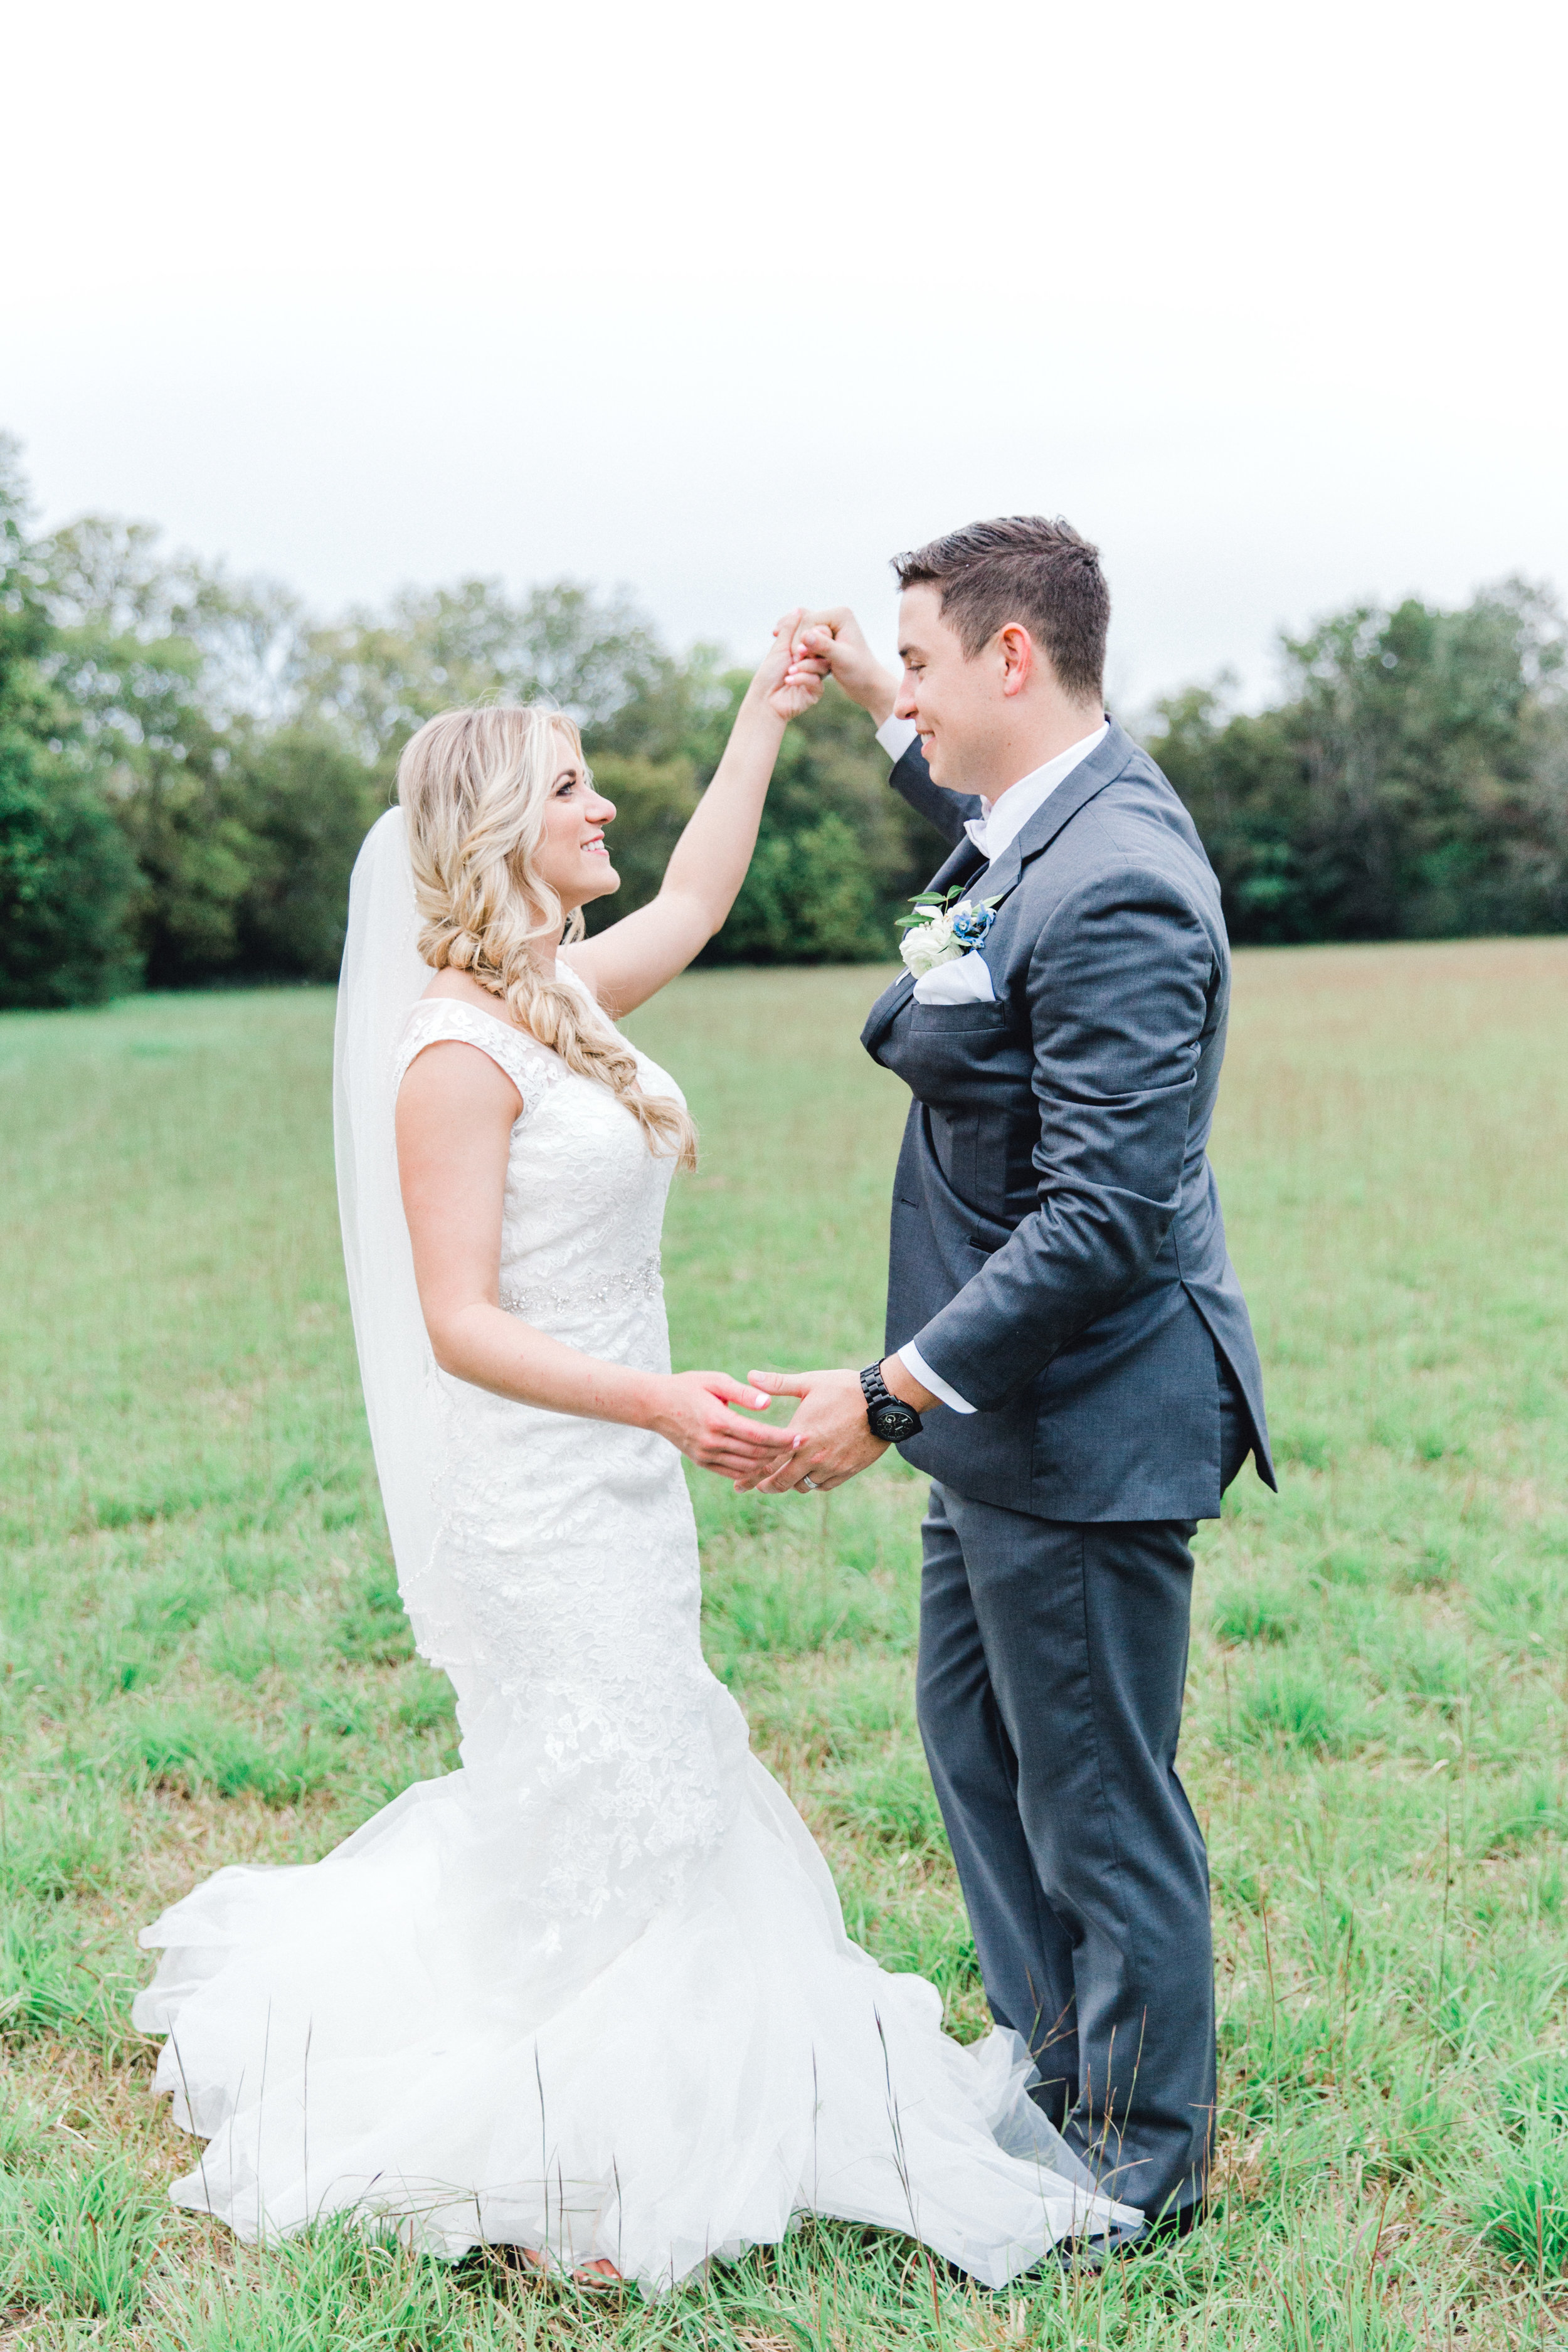 Paige-Mercer-Photography-Florida-Wedding-Photographer-Alyssa&Drew-75.jpg